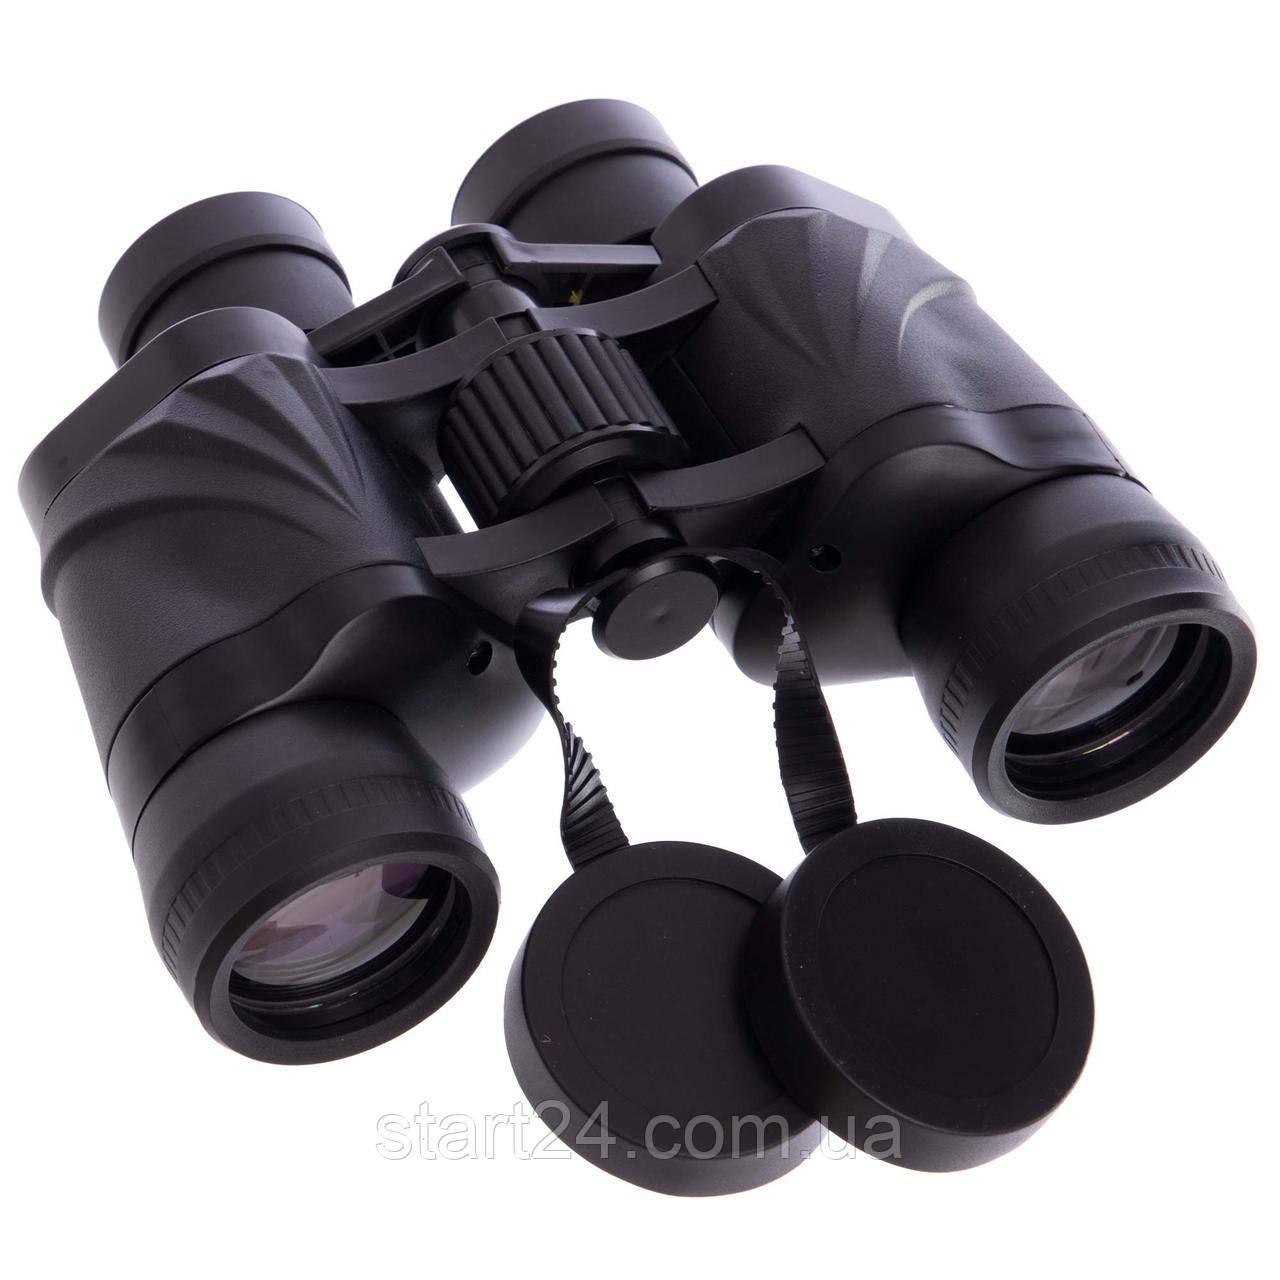 Бинокль BUSHNELL 8х40 AXT1136-S (пластик, стекло, PVC-чехол, черный)